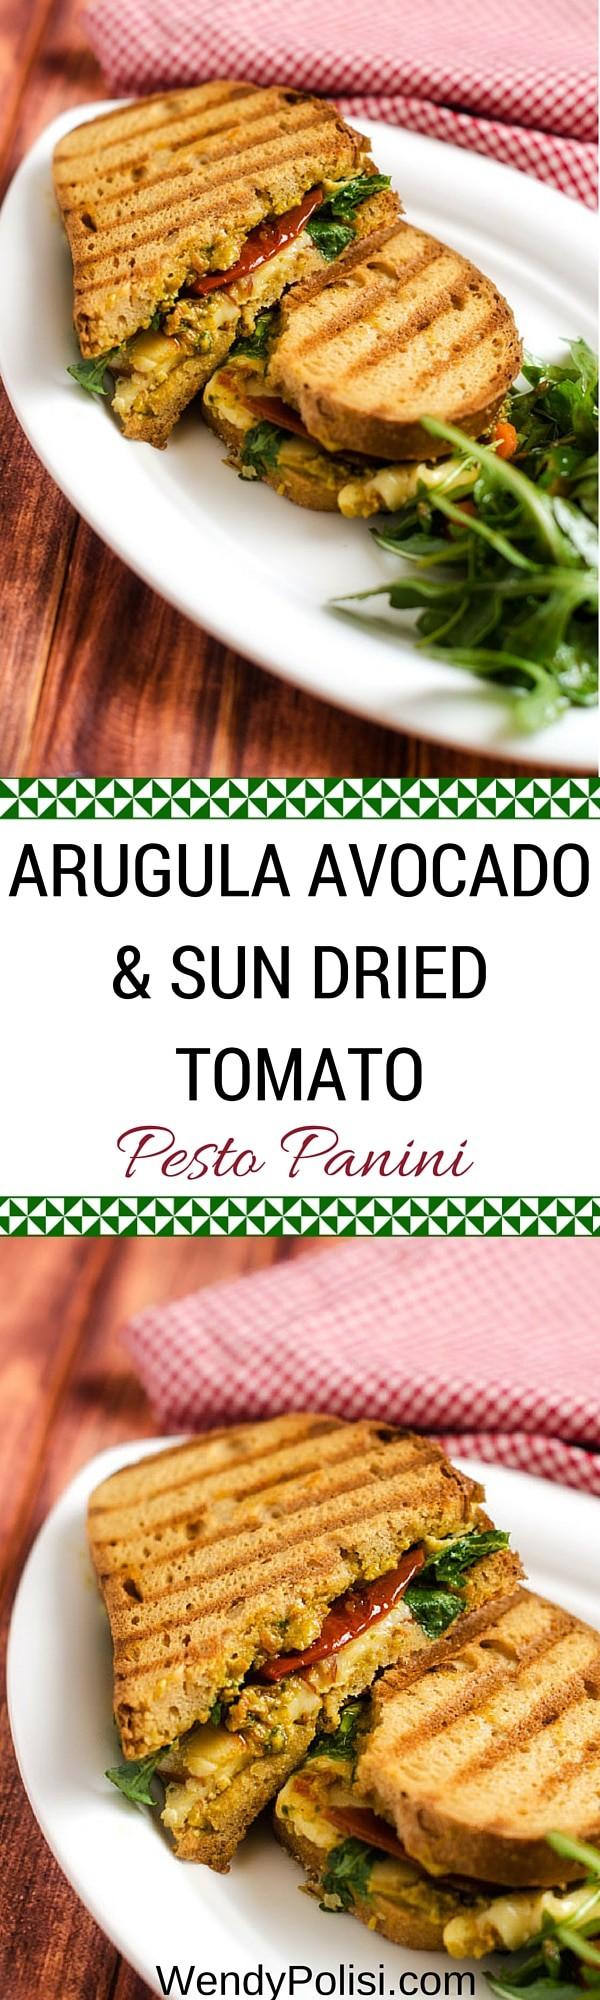 Arugula Avocado & Sun Dried Tomato Pesto Panini - Gluten Free